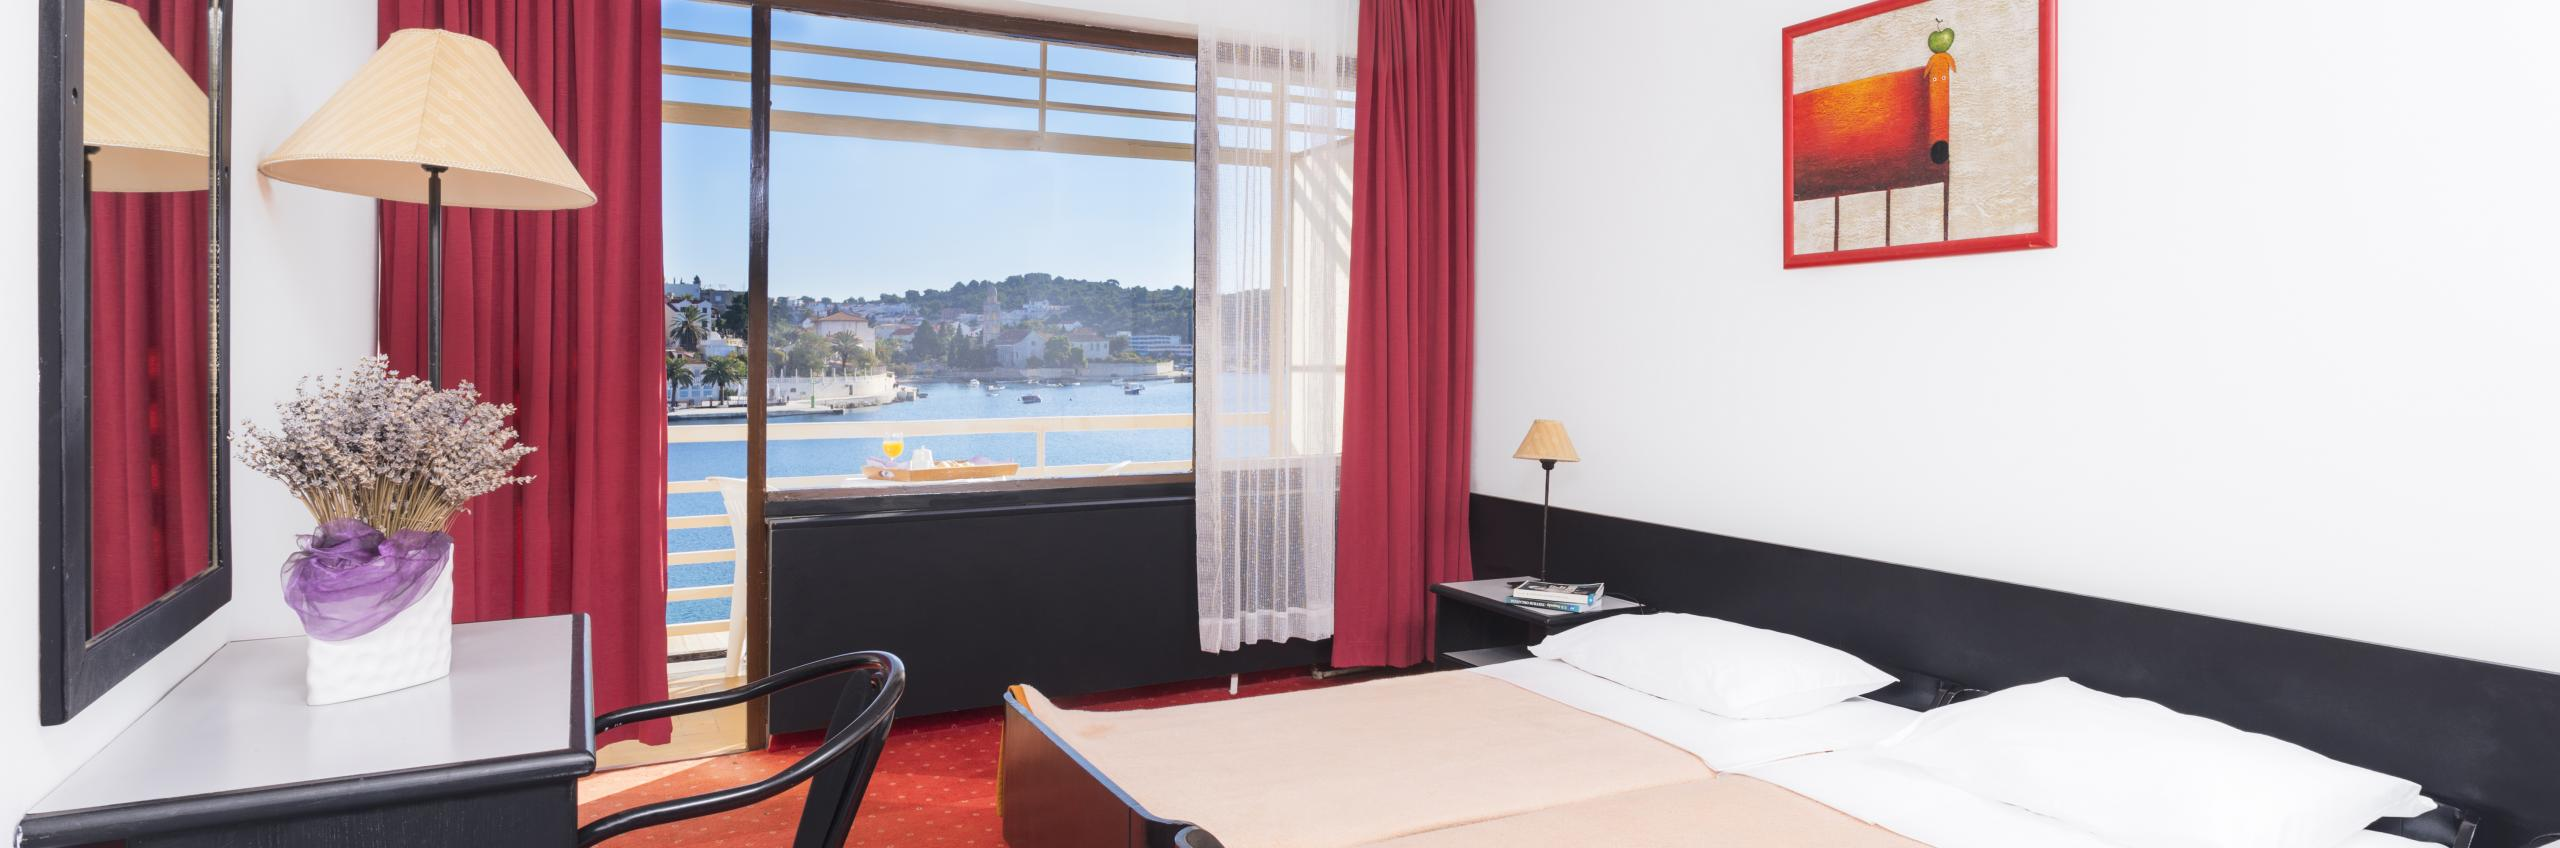 Delfin Chambres & suites